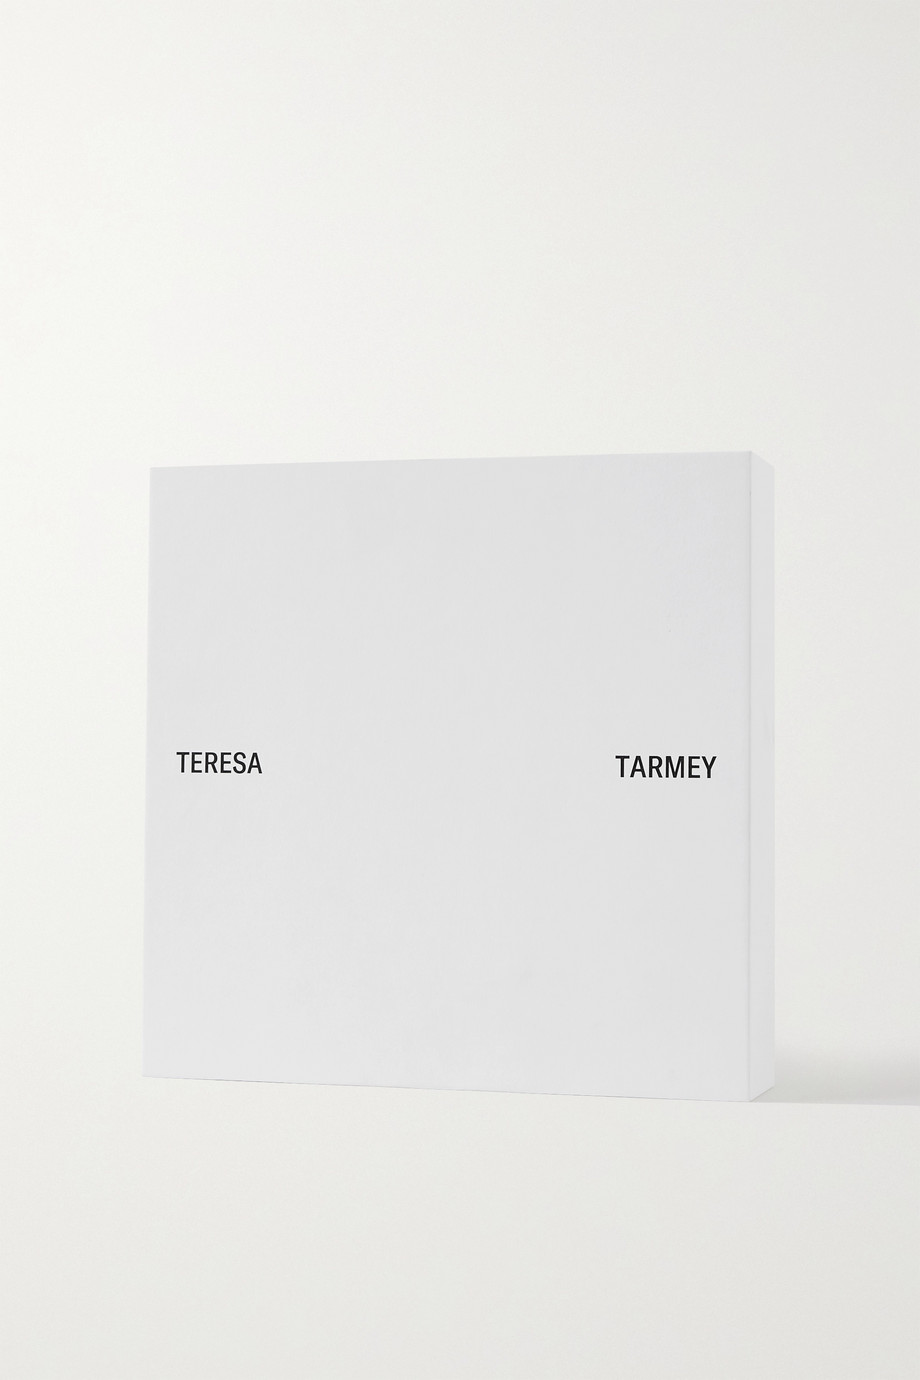 Teresa Tarmey Microneedling Kit